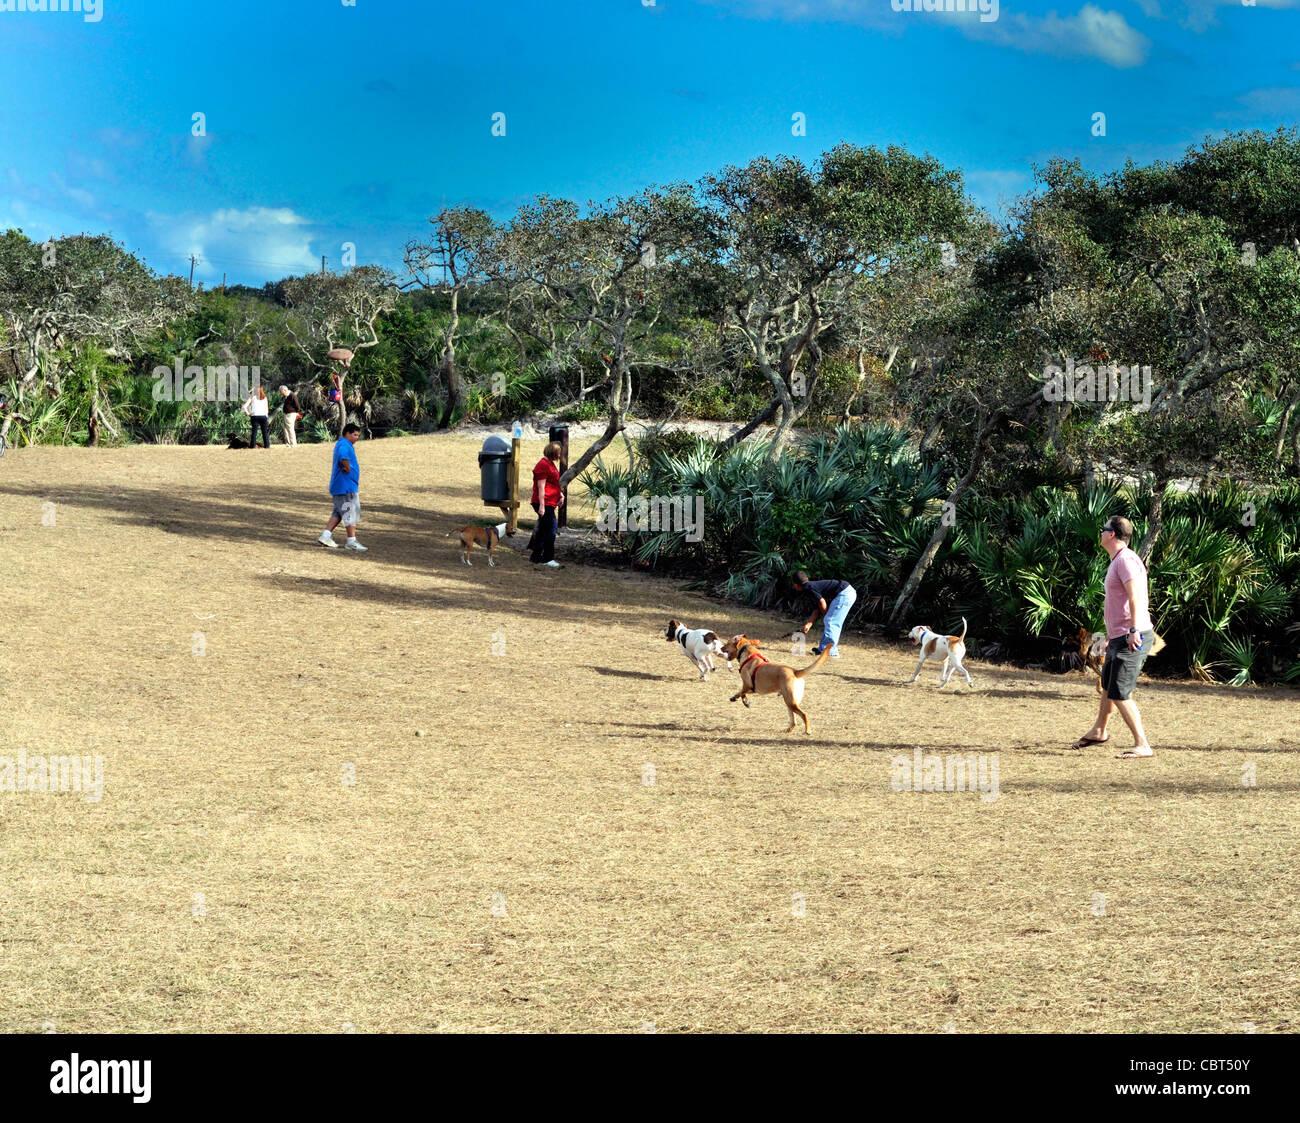 Dogs enjoying the Bicentennial park dog park in Ormond Beach, Florida - Stock Image